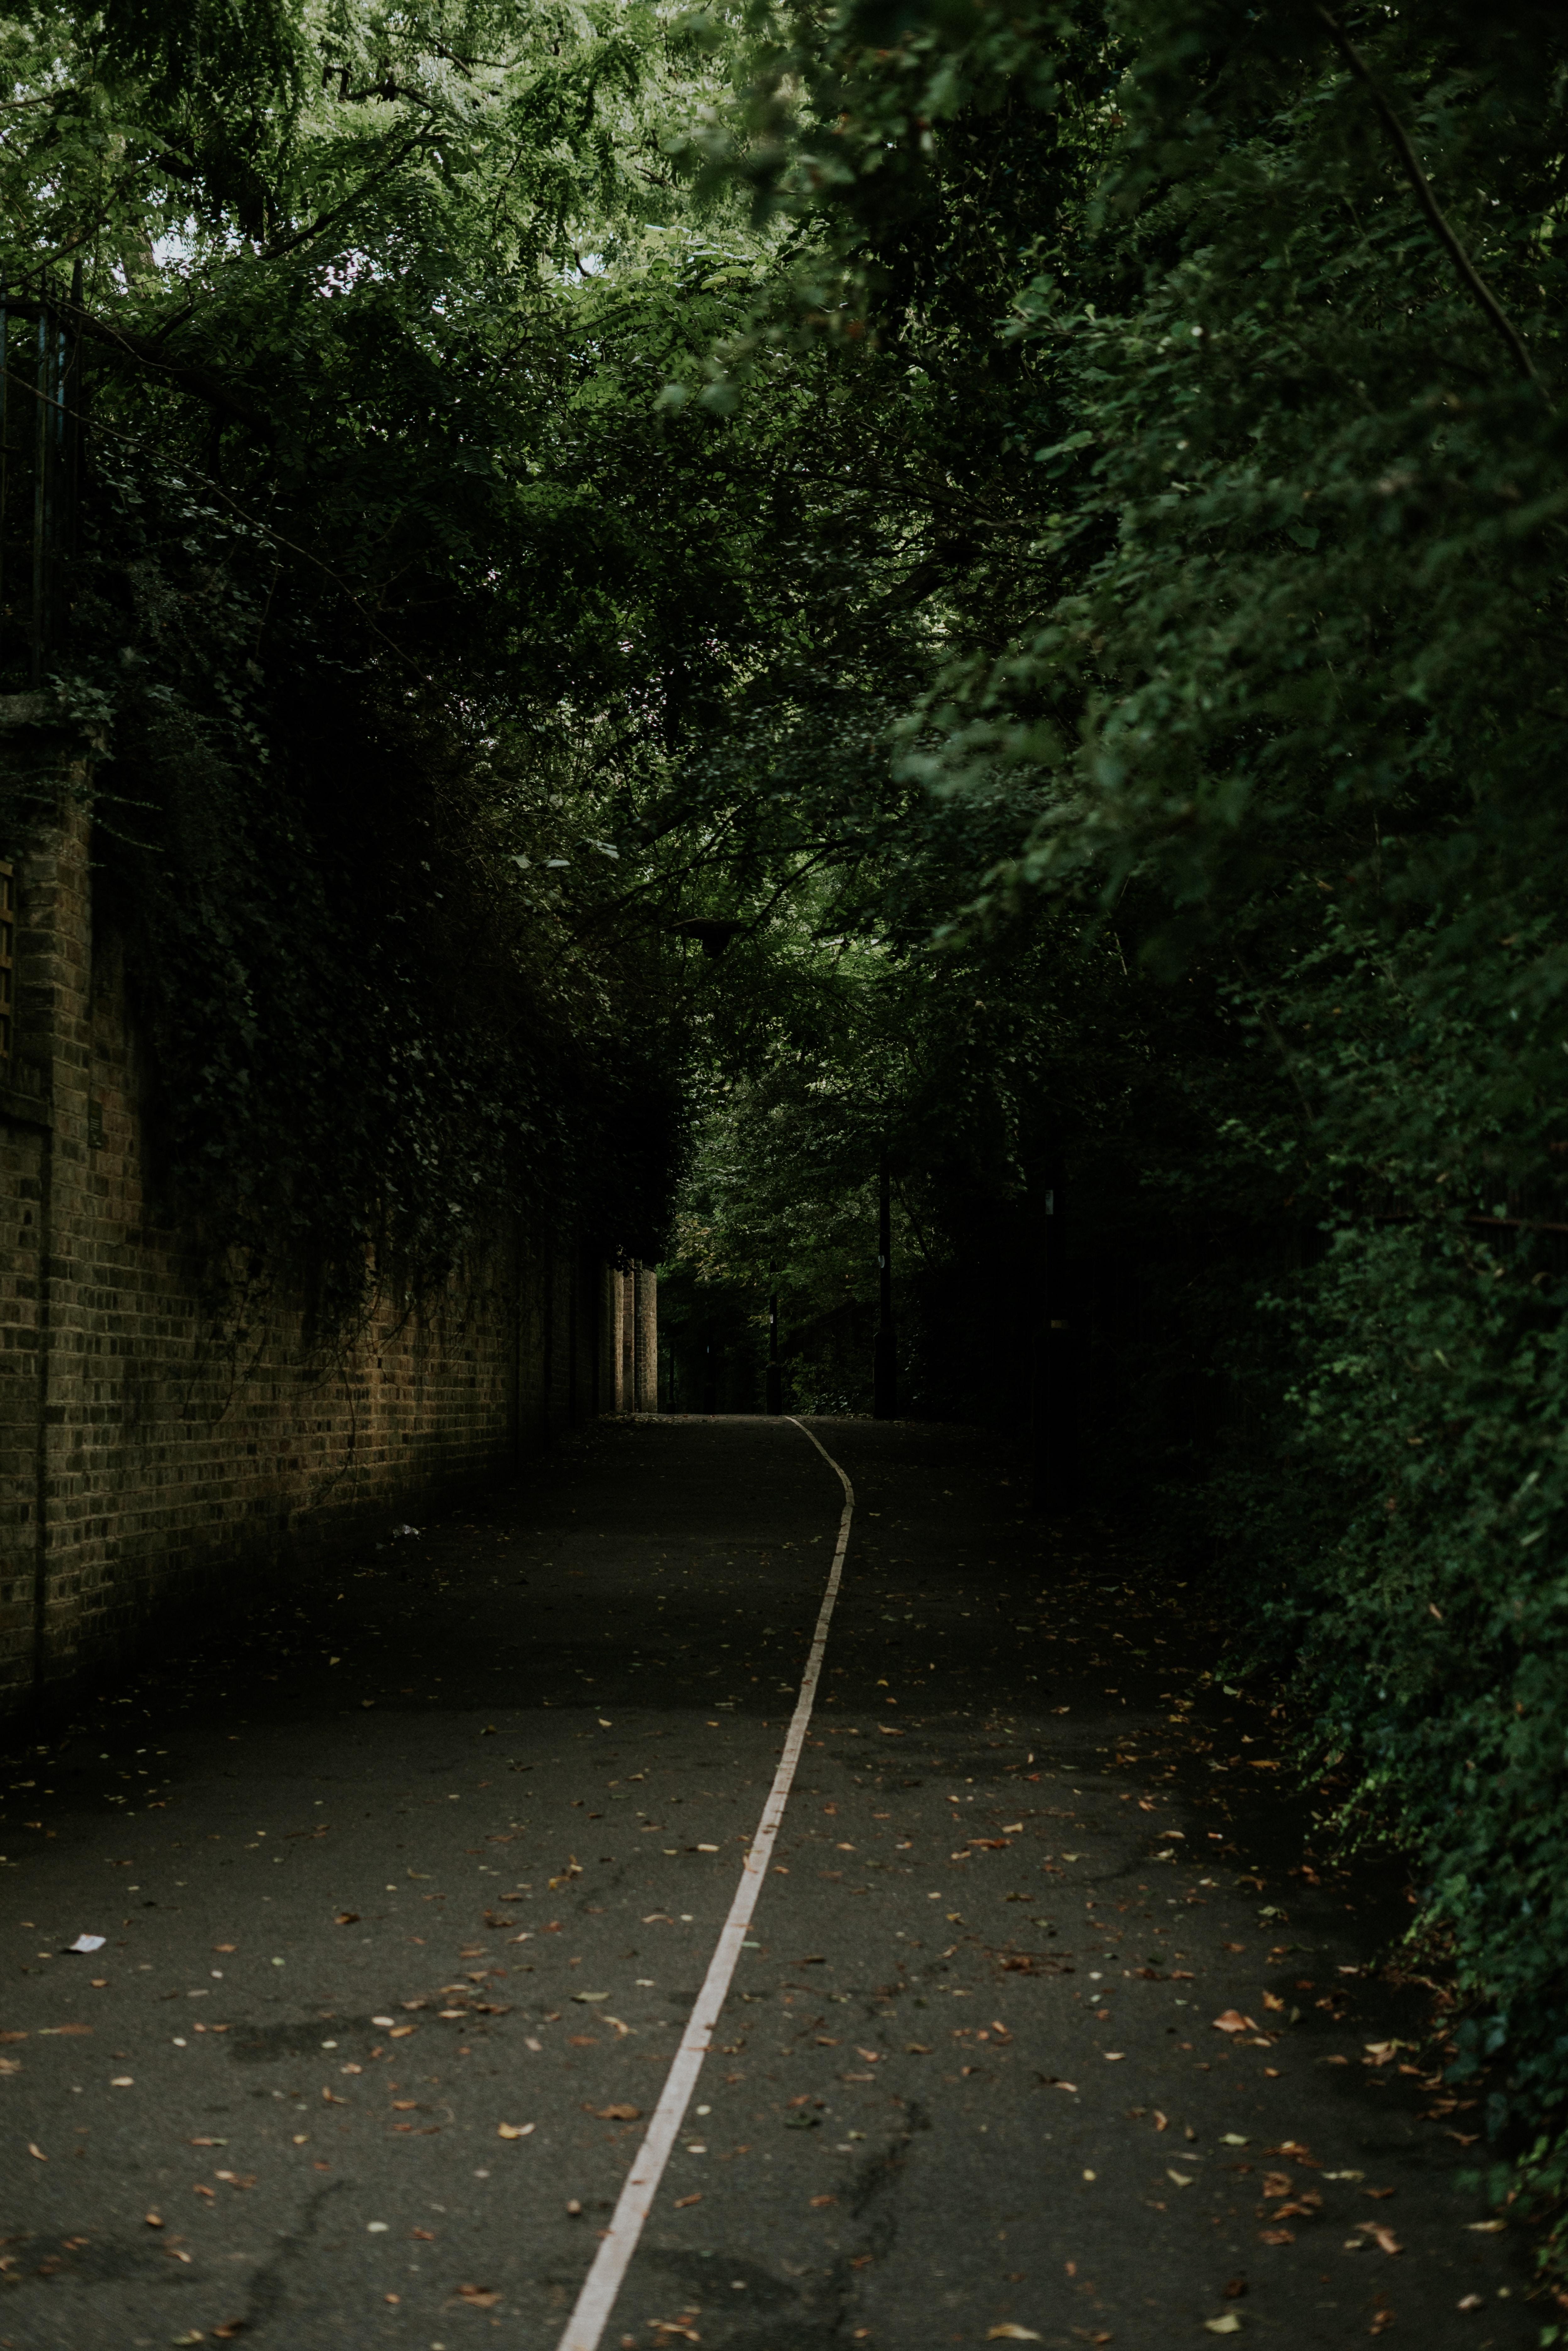 pavement between brick wall and trees